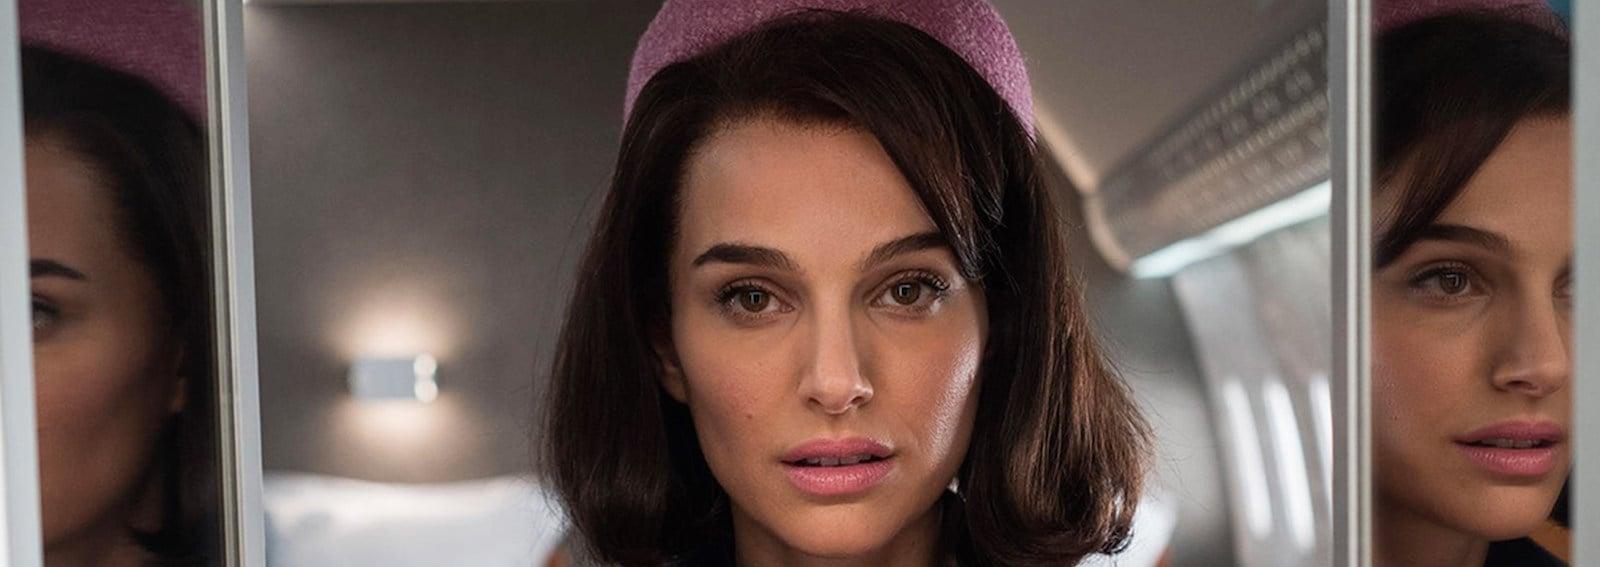 Natalie Portman cappello rosa